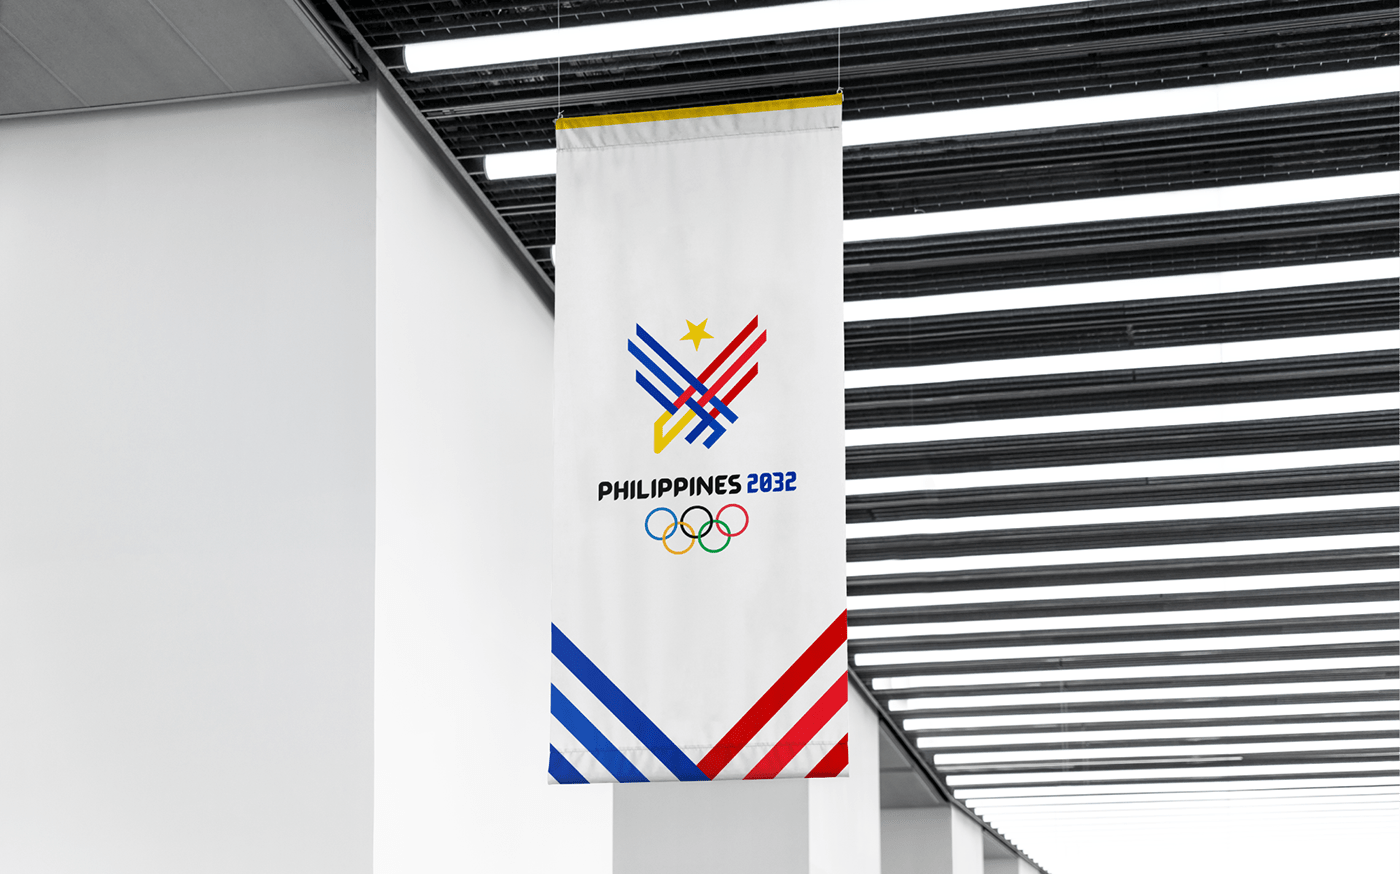 Philippines 2032 Olympics Logo on Behance